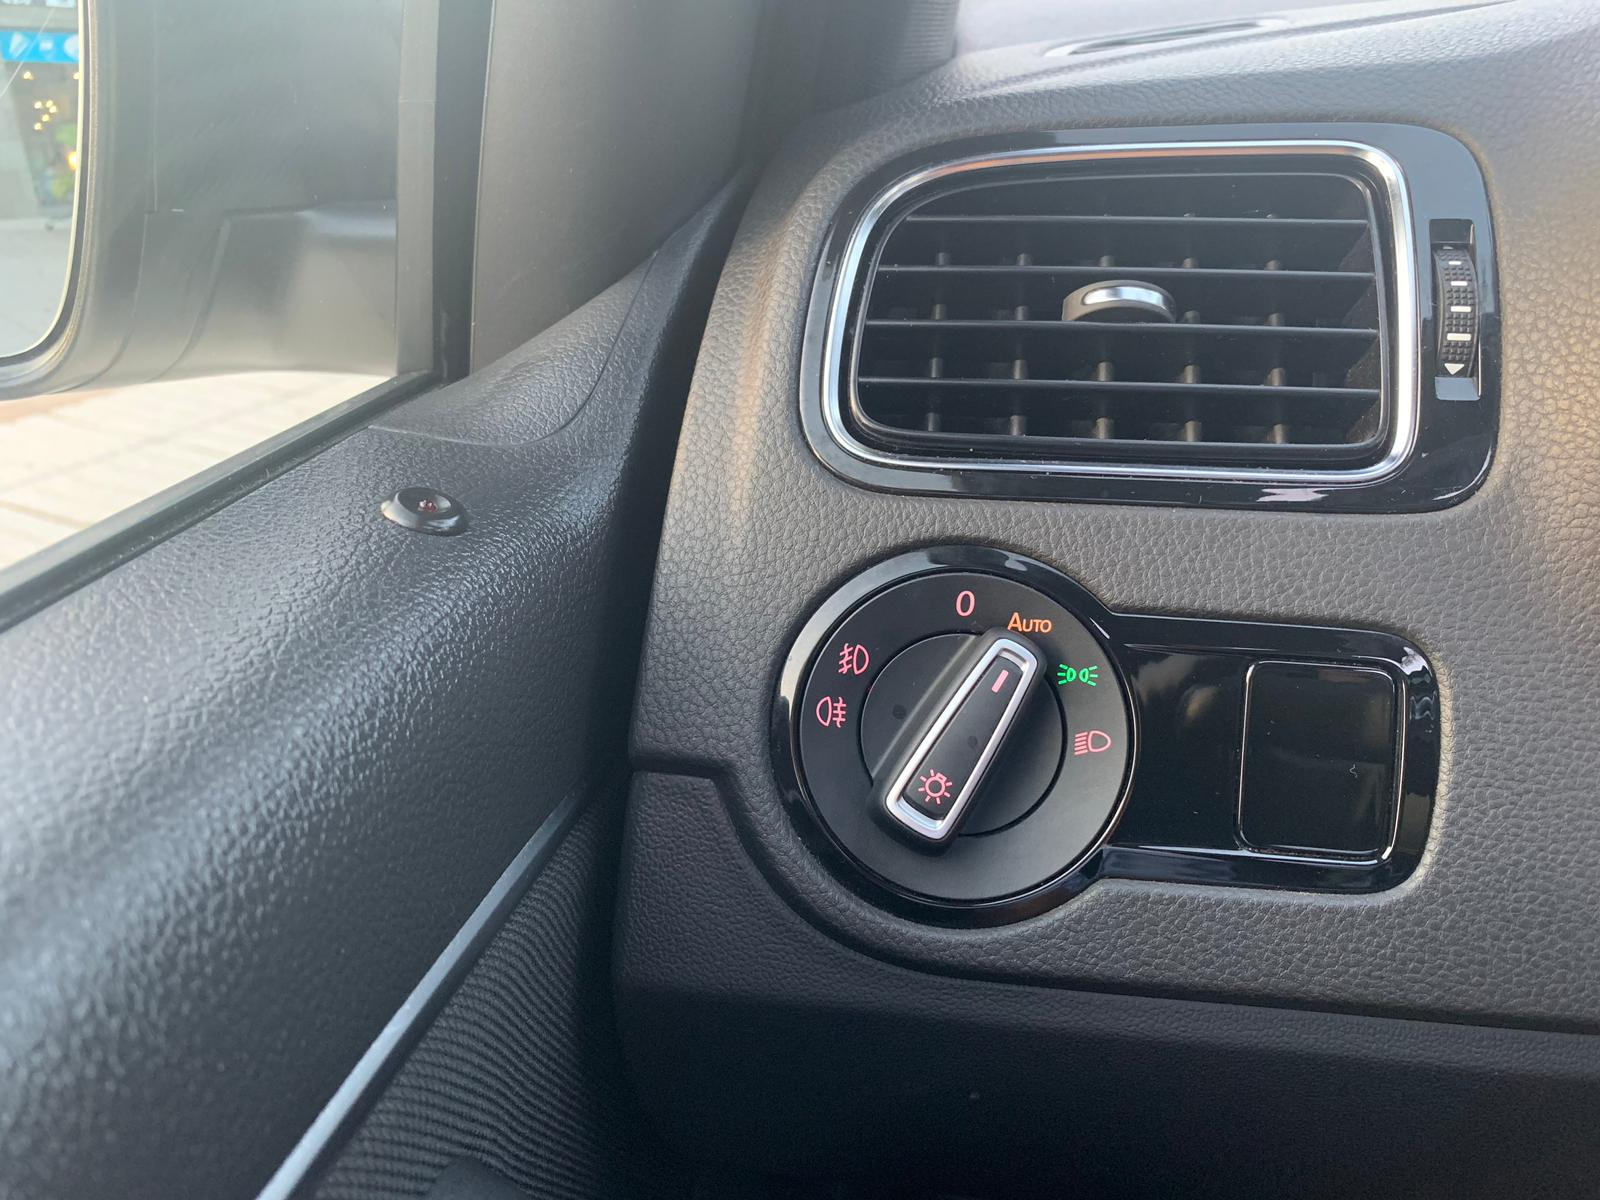 POLO GTI 1.9TSI 190 CV 2015 SEP19 (18)